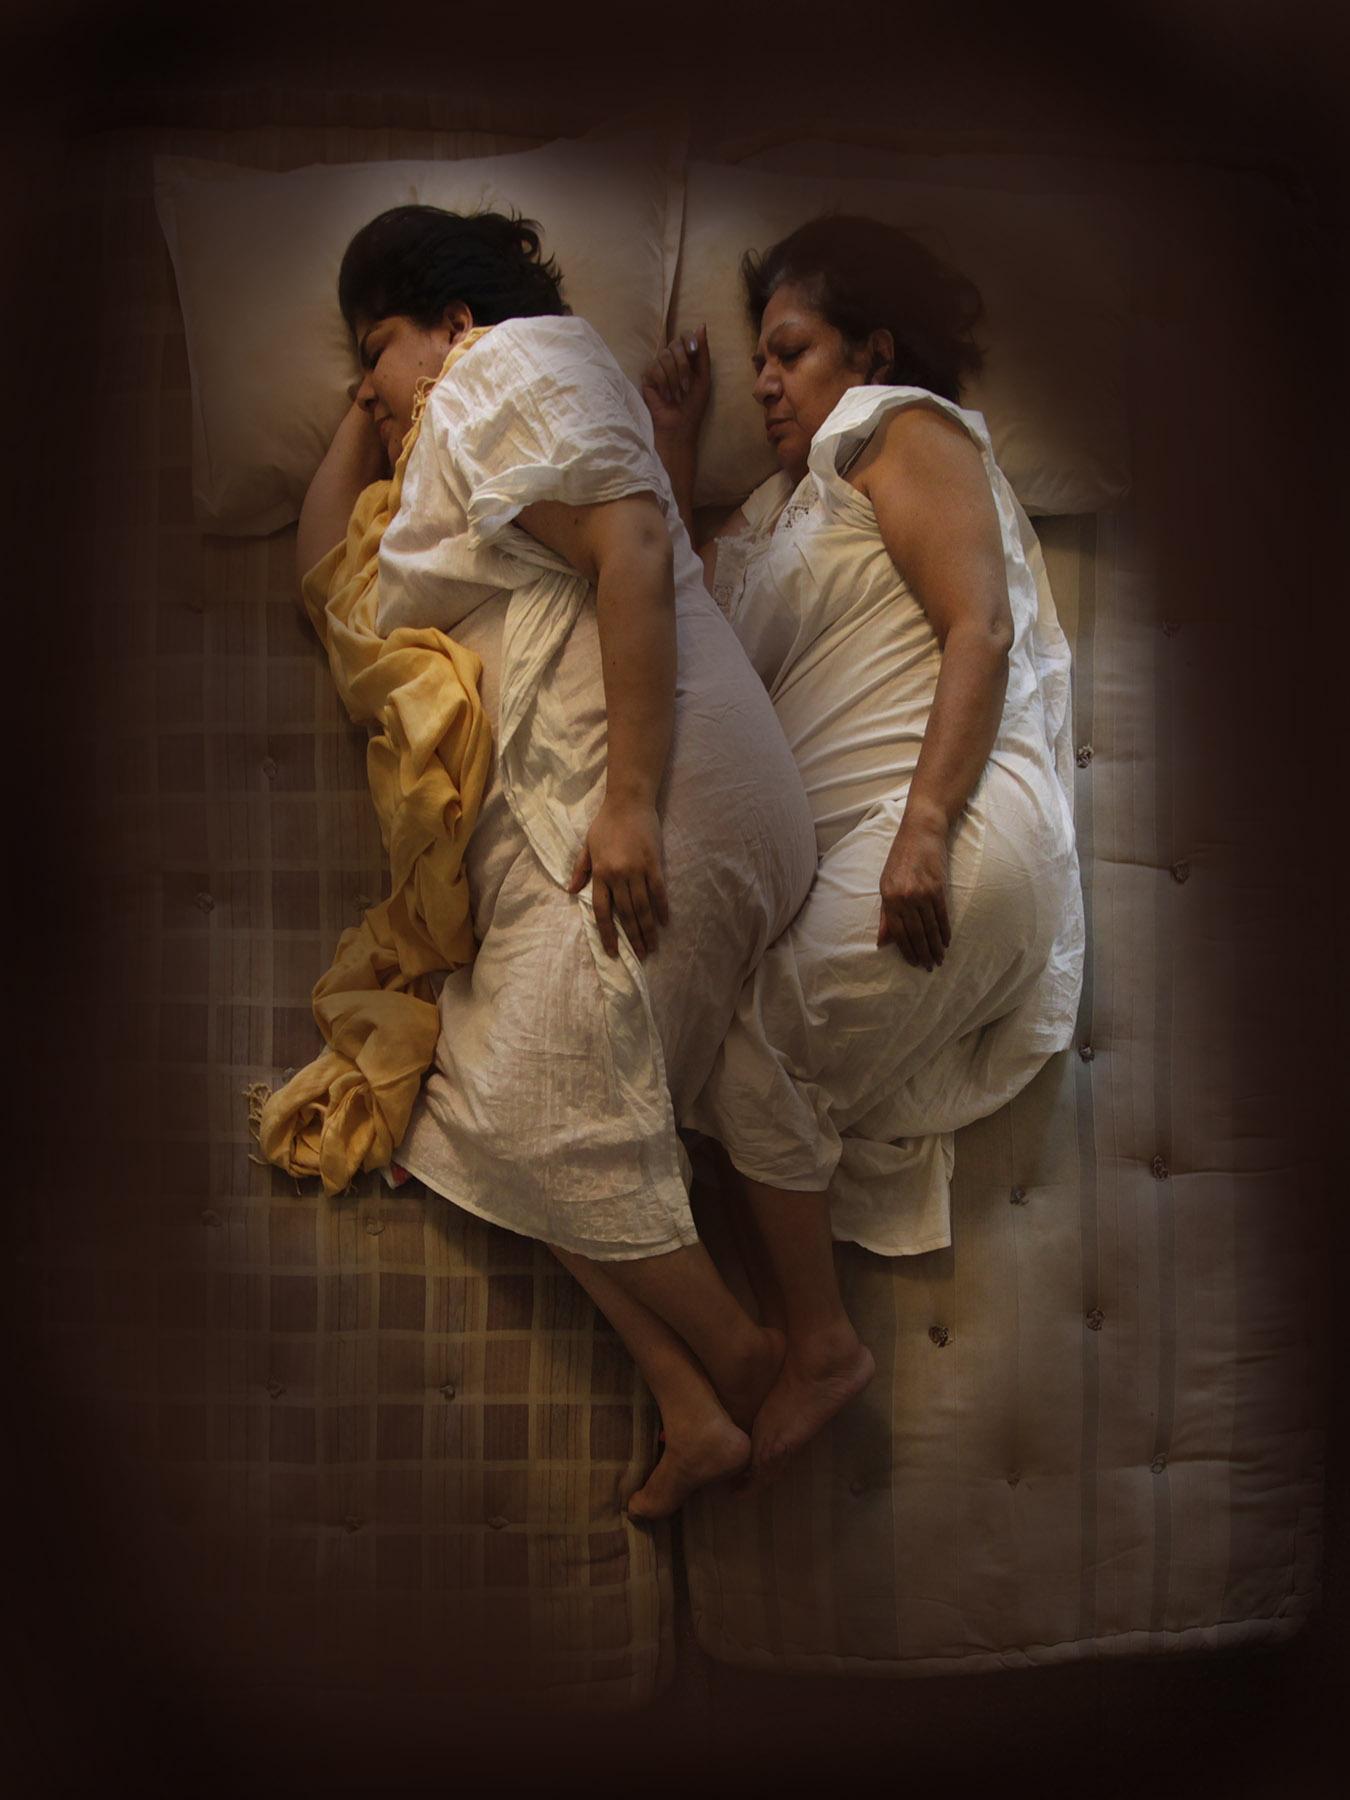 sleep wrestlers [m-other] 4.jpg